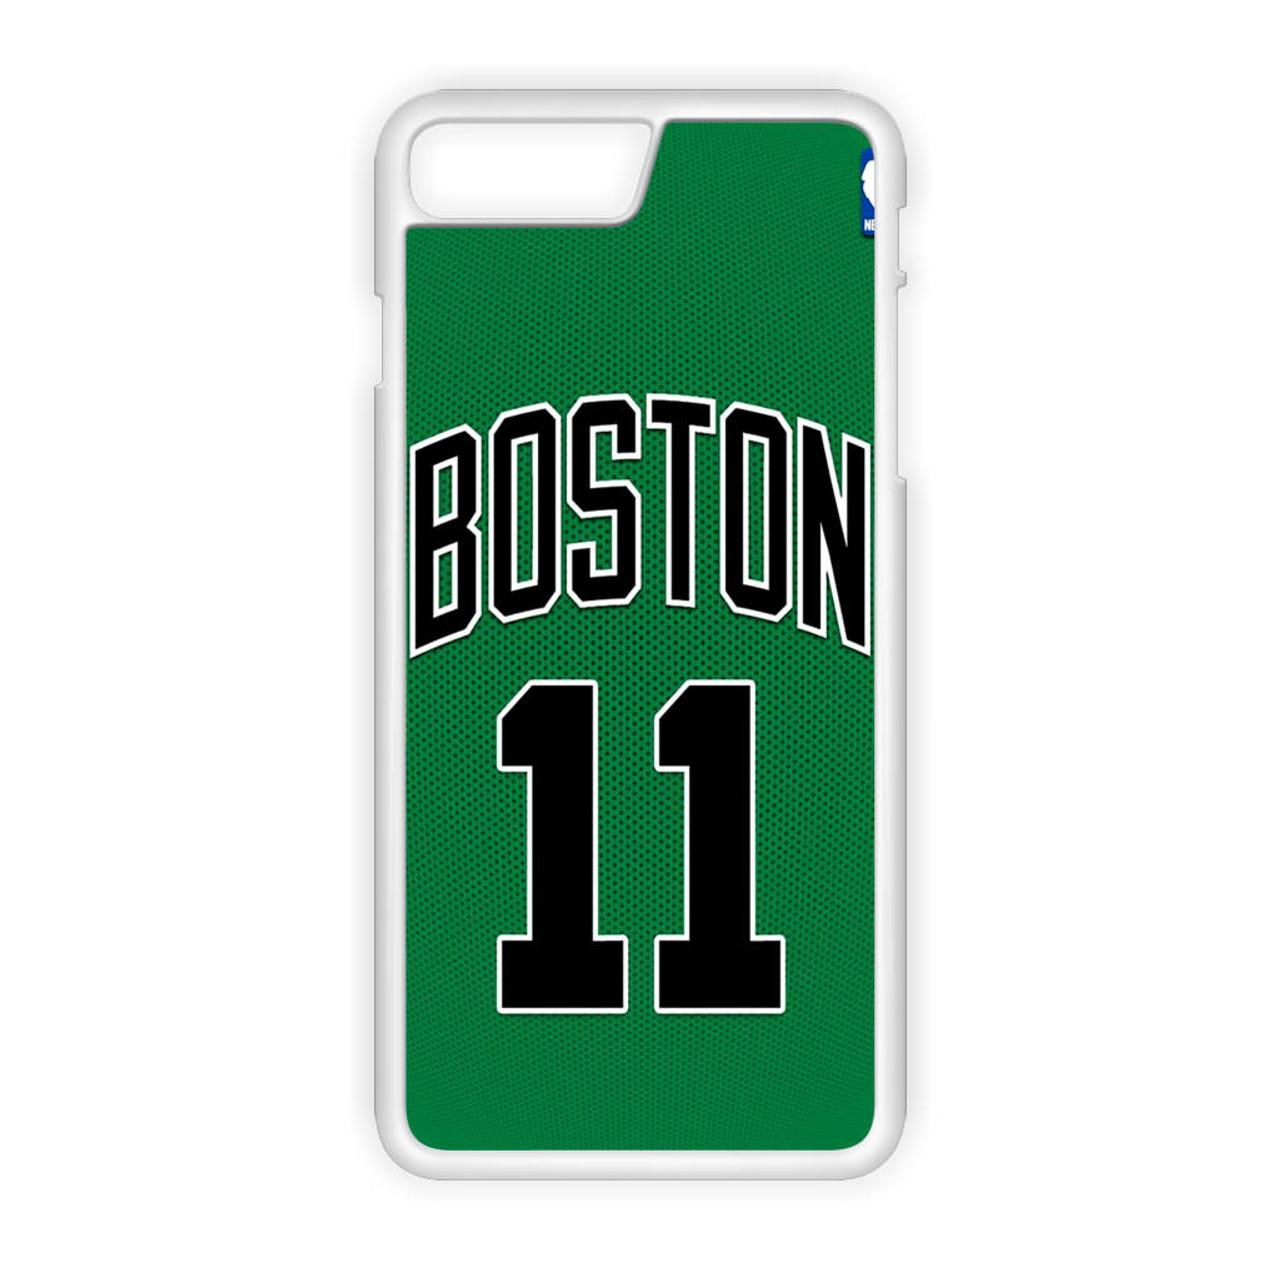 Boston Celtics 3 iphone case